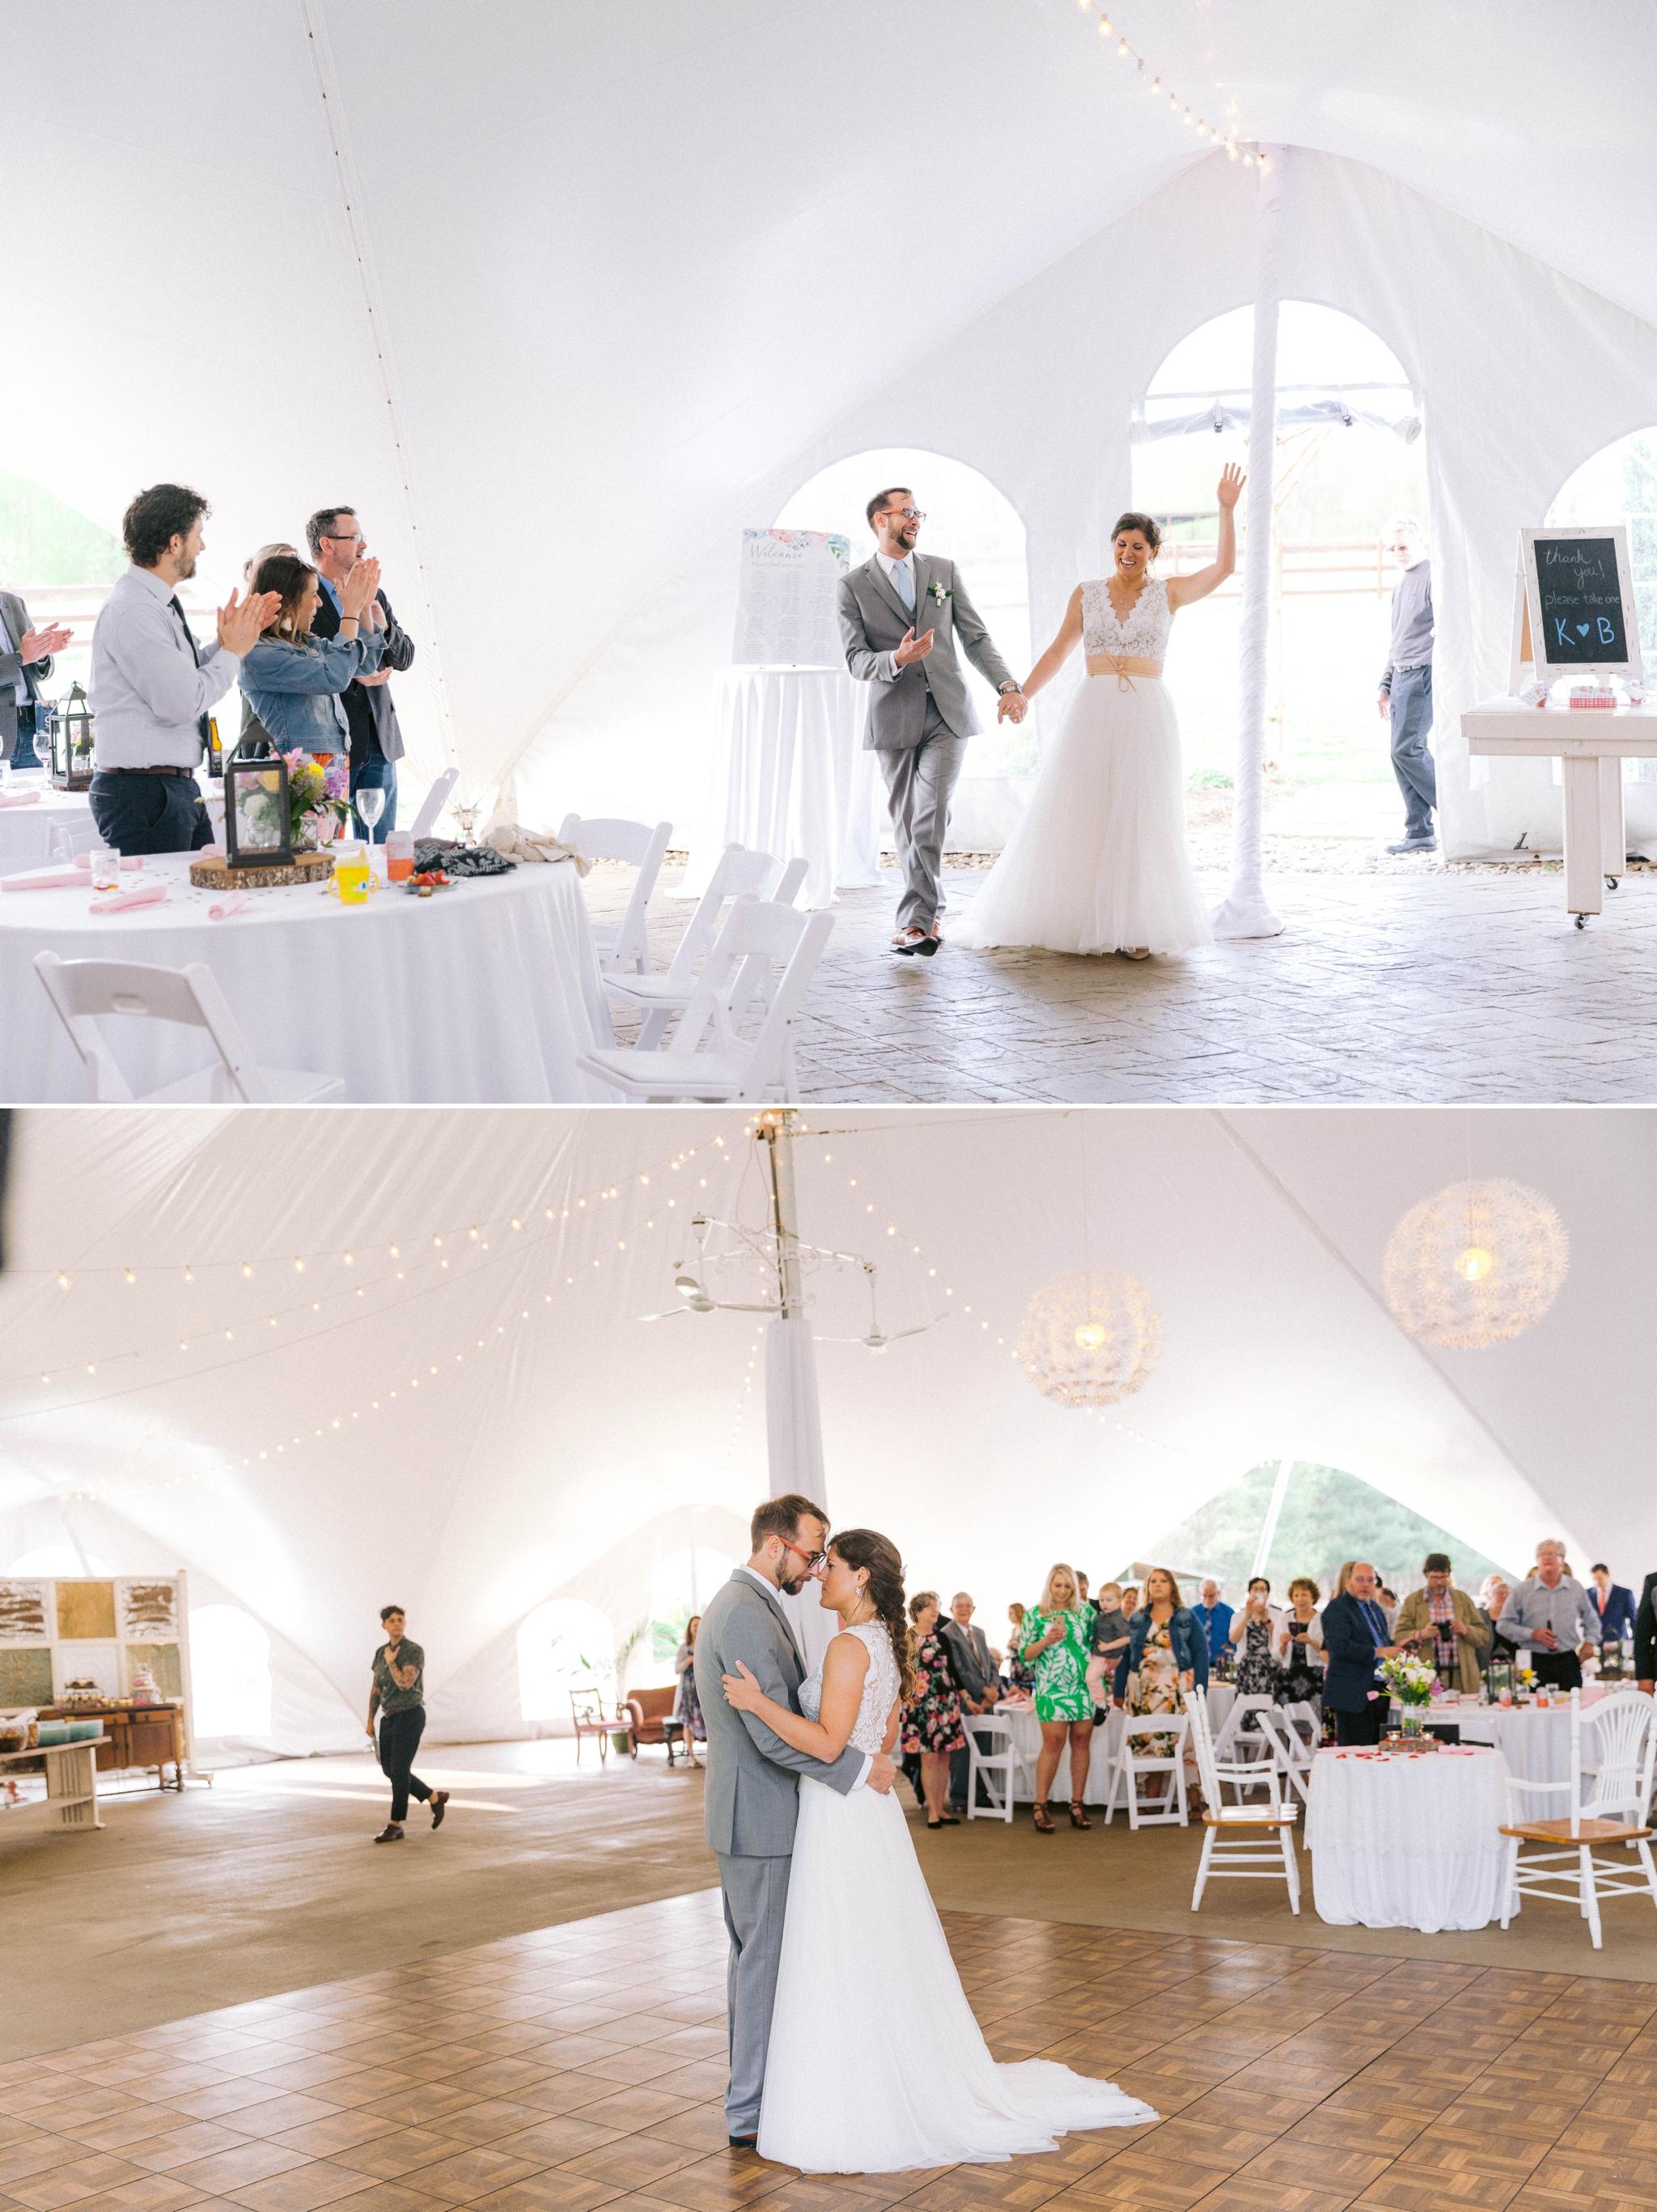 bride and groom entering venue - Honolulu Oahu Hawaii Wedding Photographer